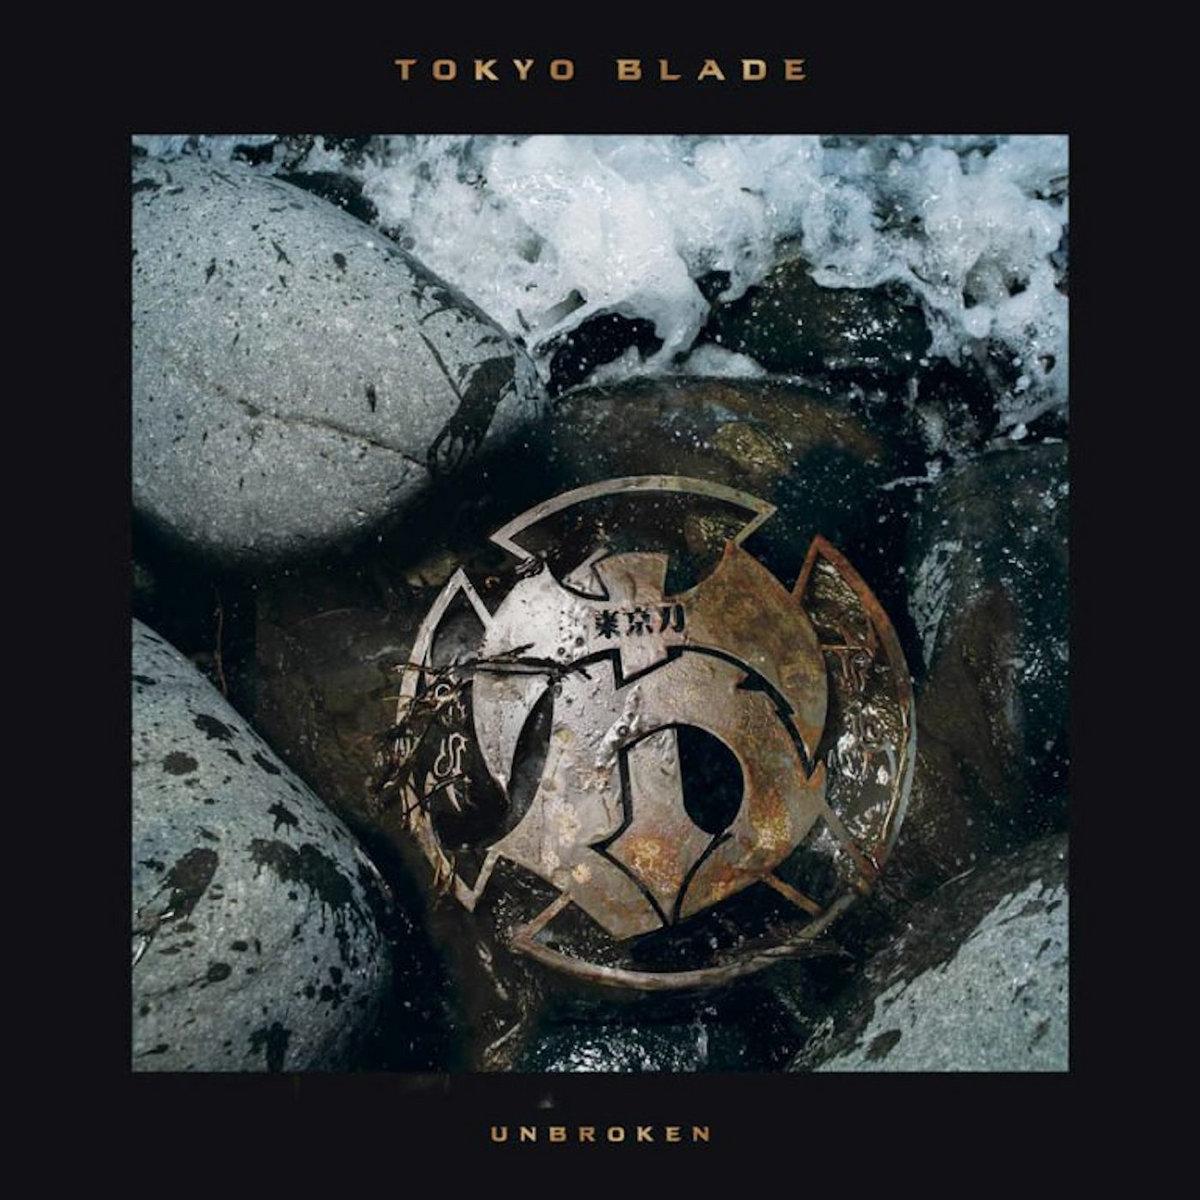 Tokyo Blade - Unbroken